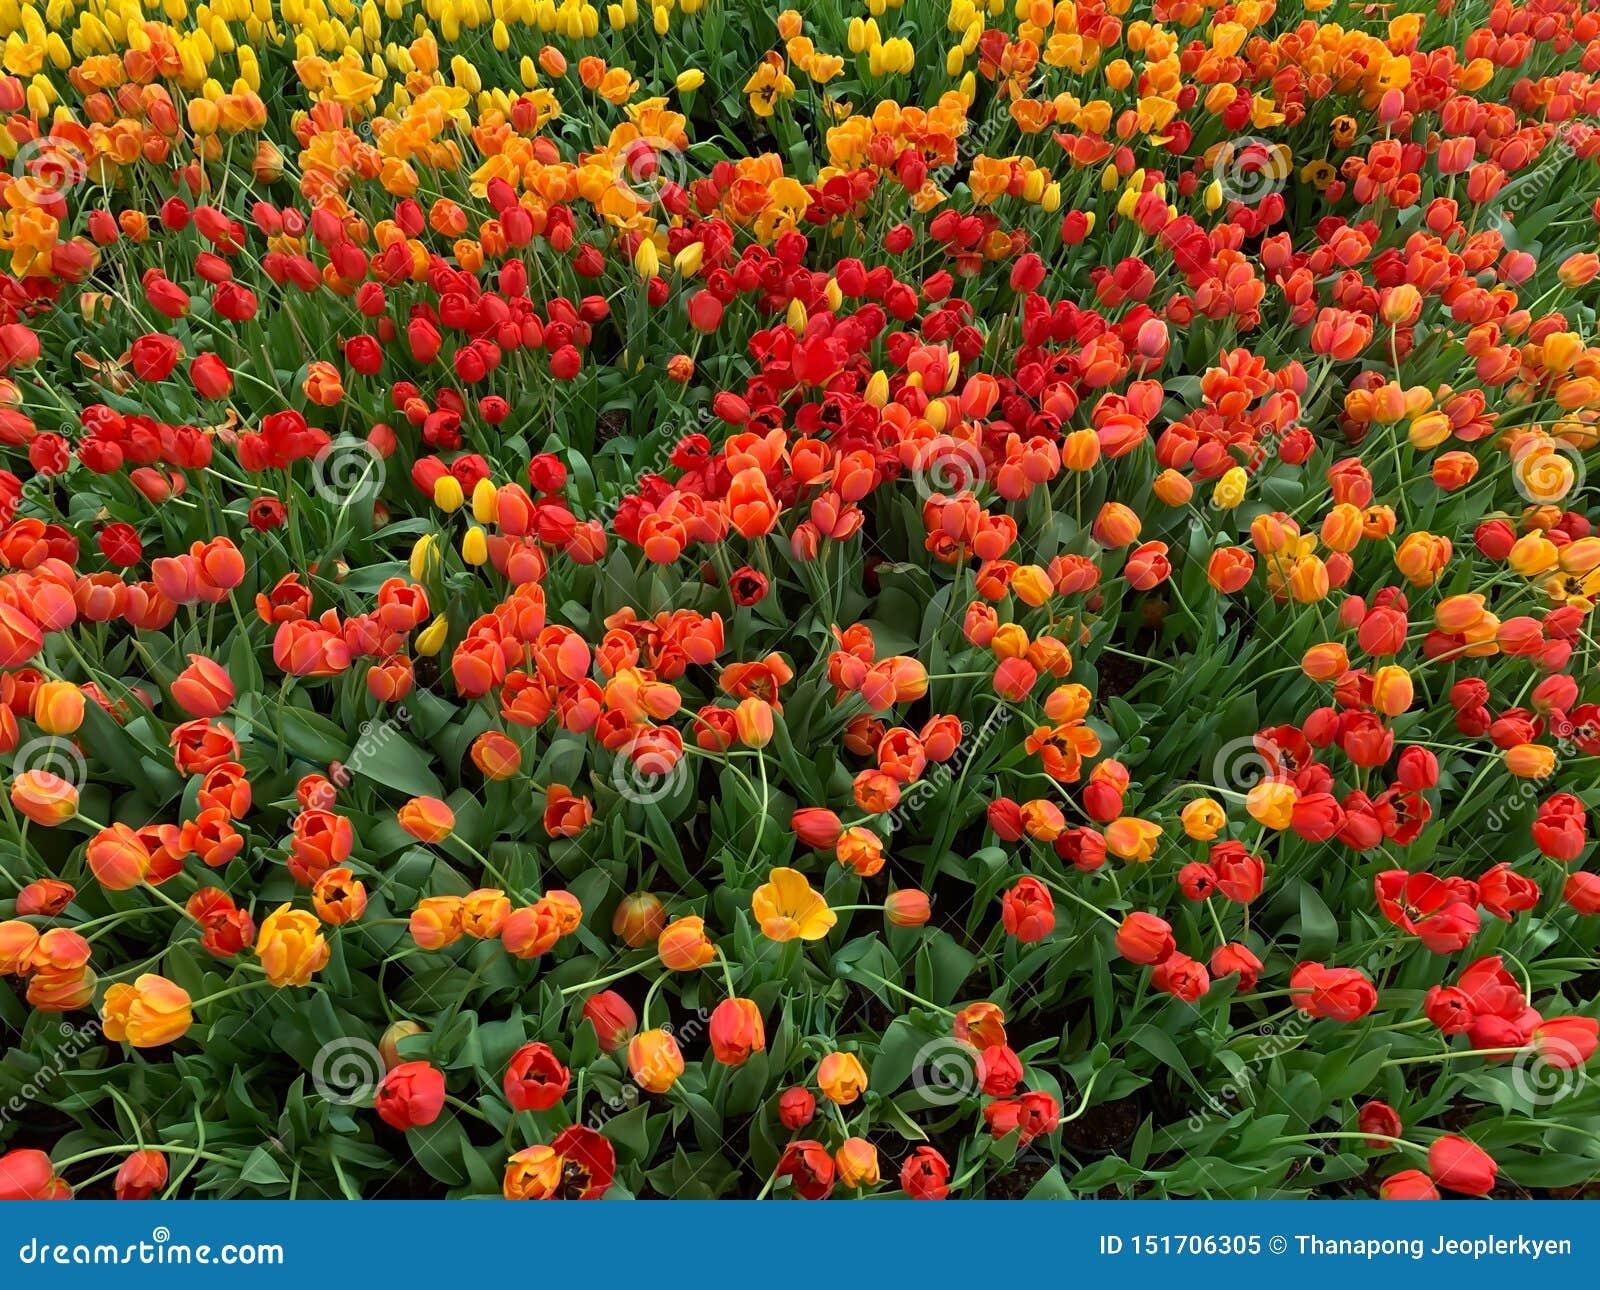 The orange flowers background